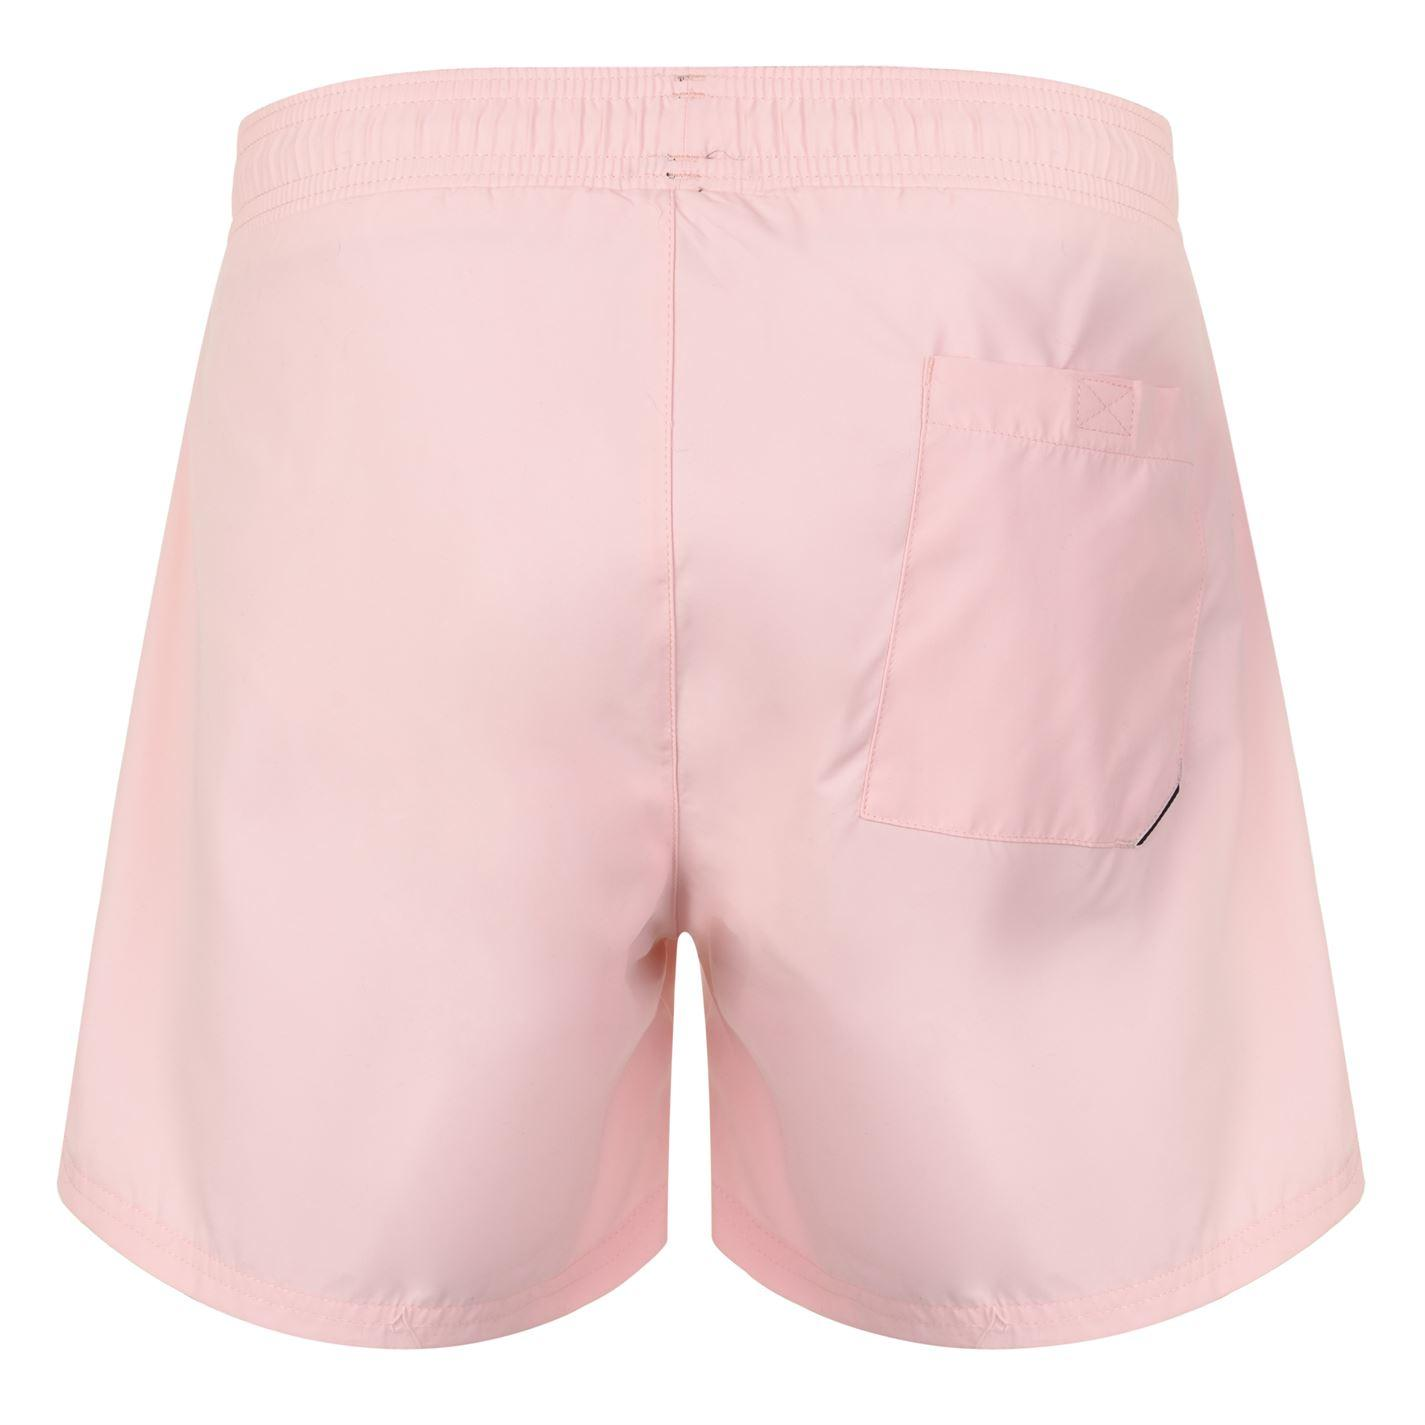 6f17b5b7 BOSS by Hugo Boss - Pink Dry Logo Swim Shorts for Men - Lyst. View  fullscreen